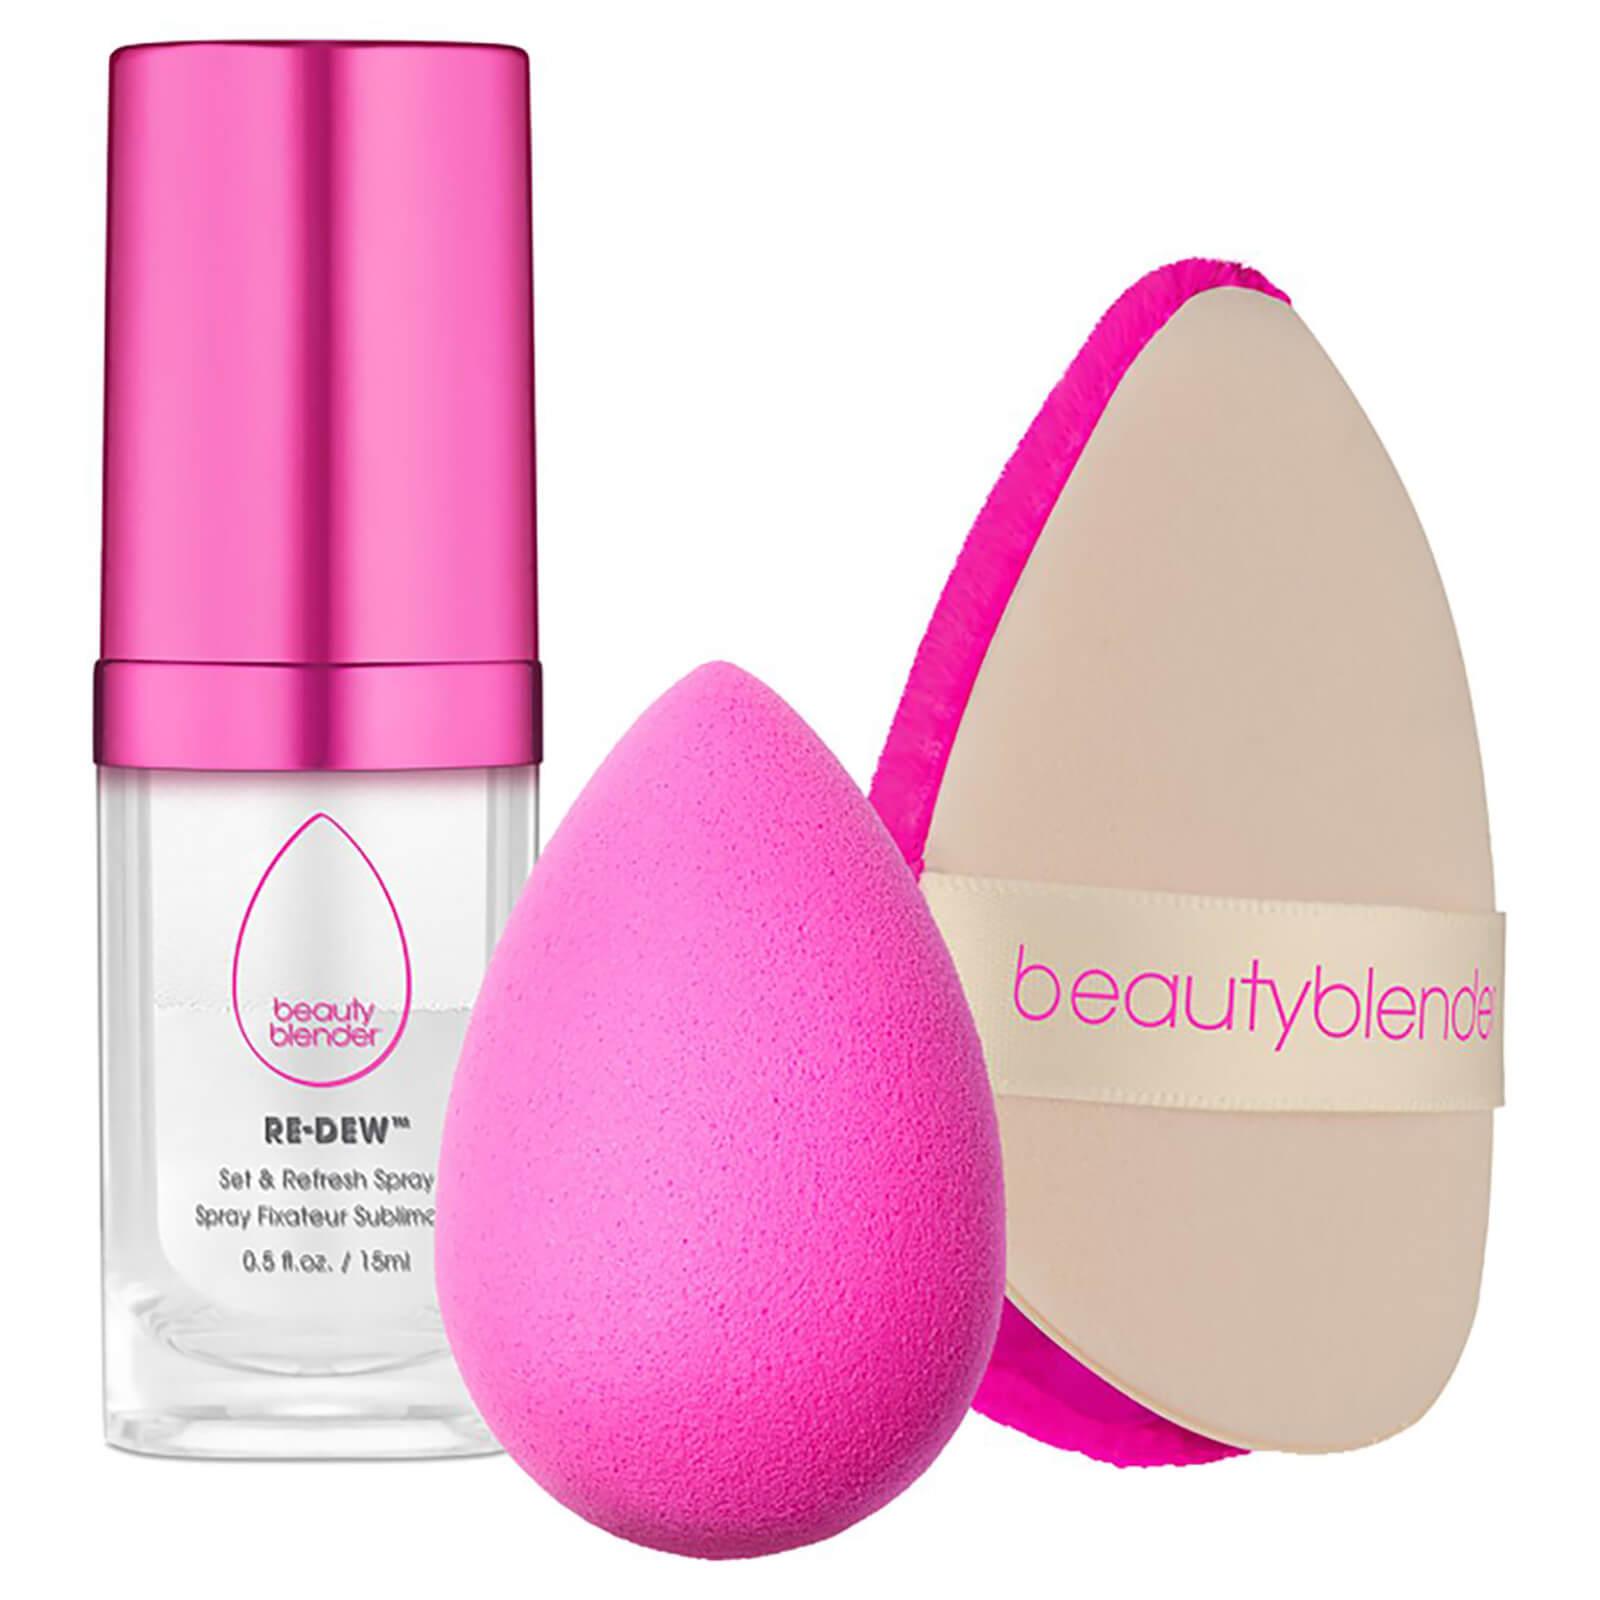 beautyblender 美妆蛋+粉扑+定妆喷雾套装